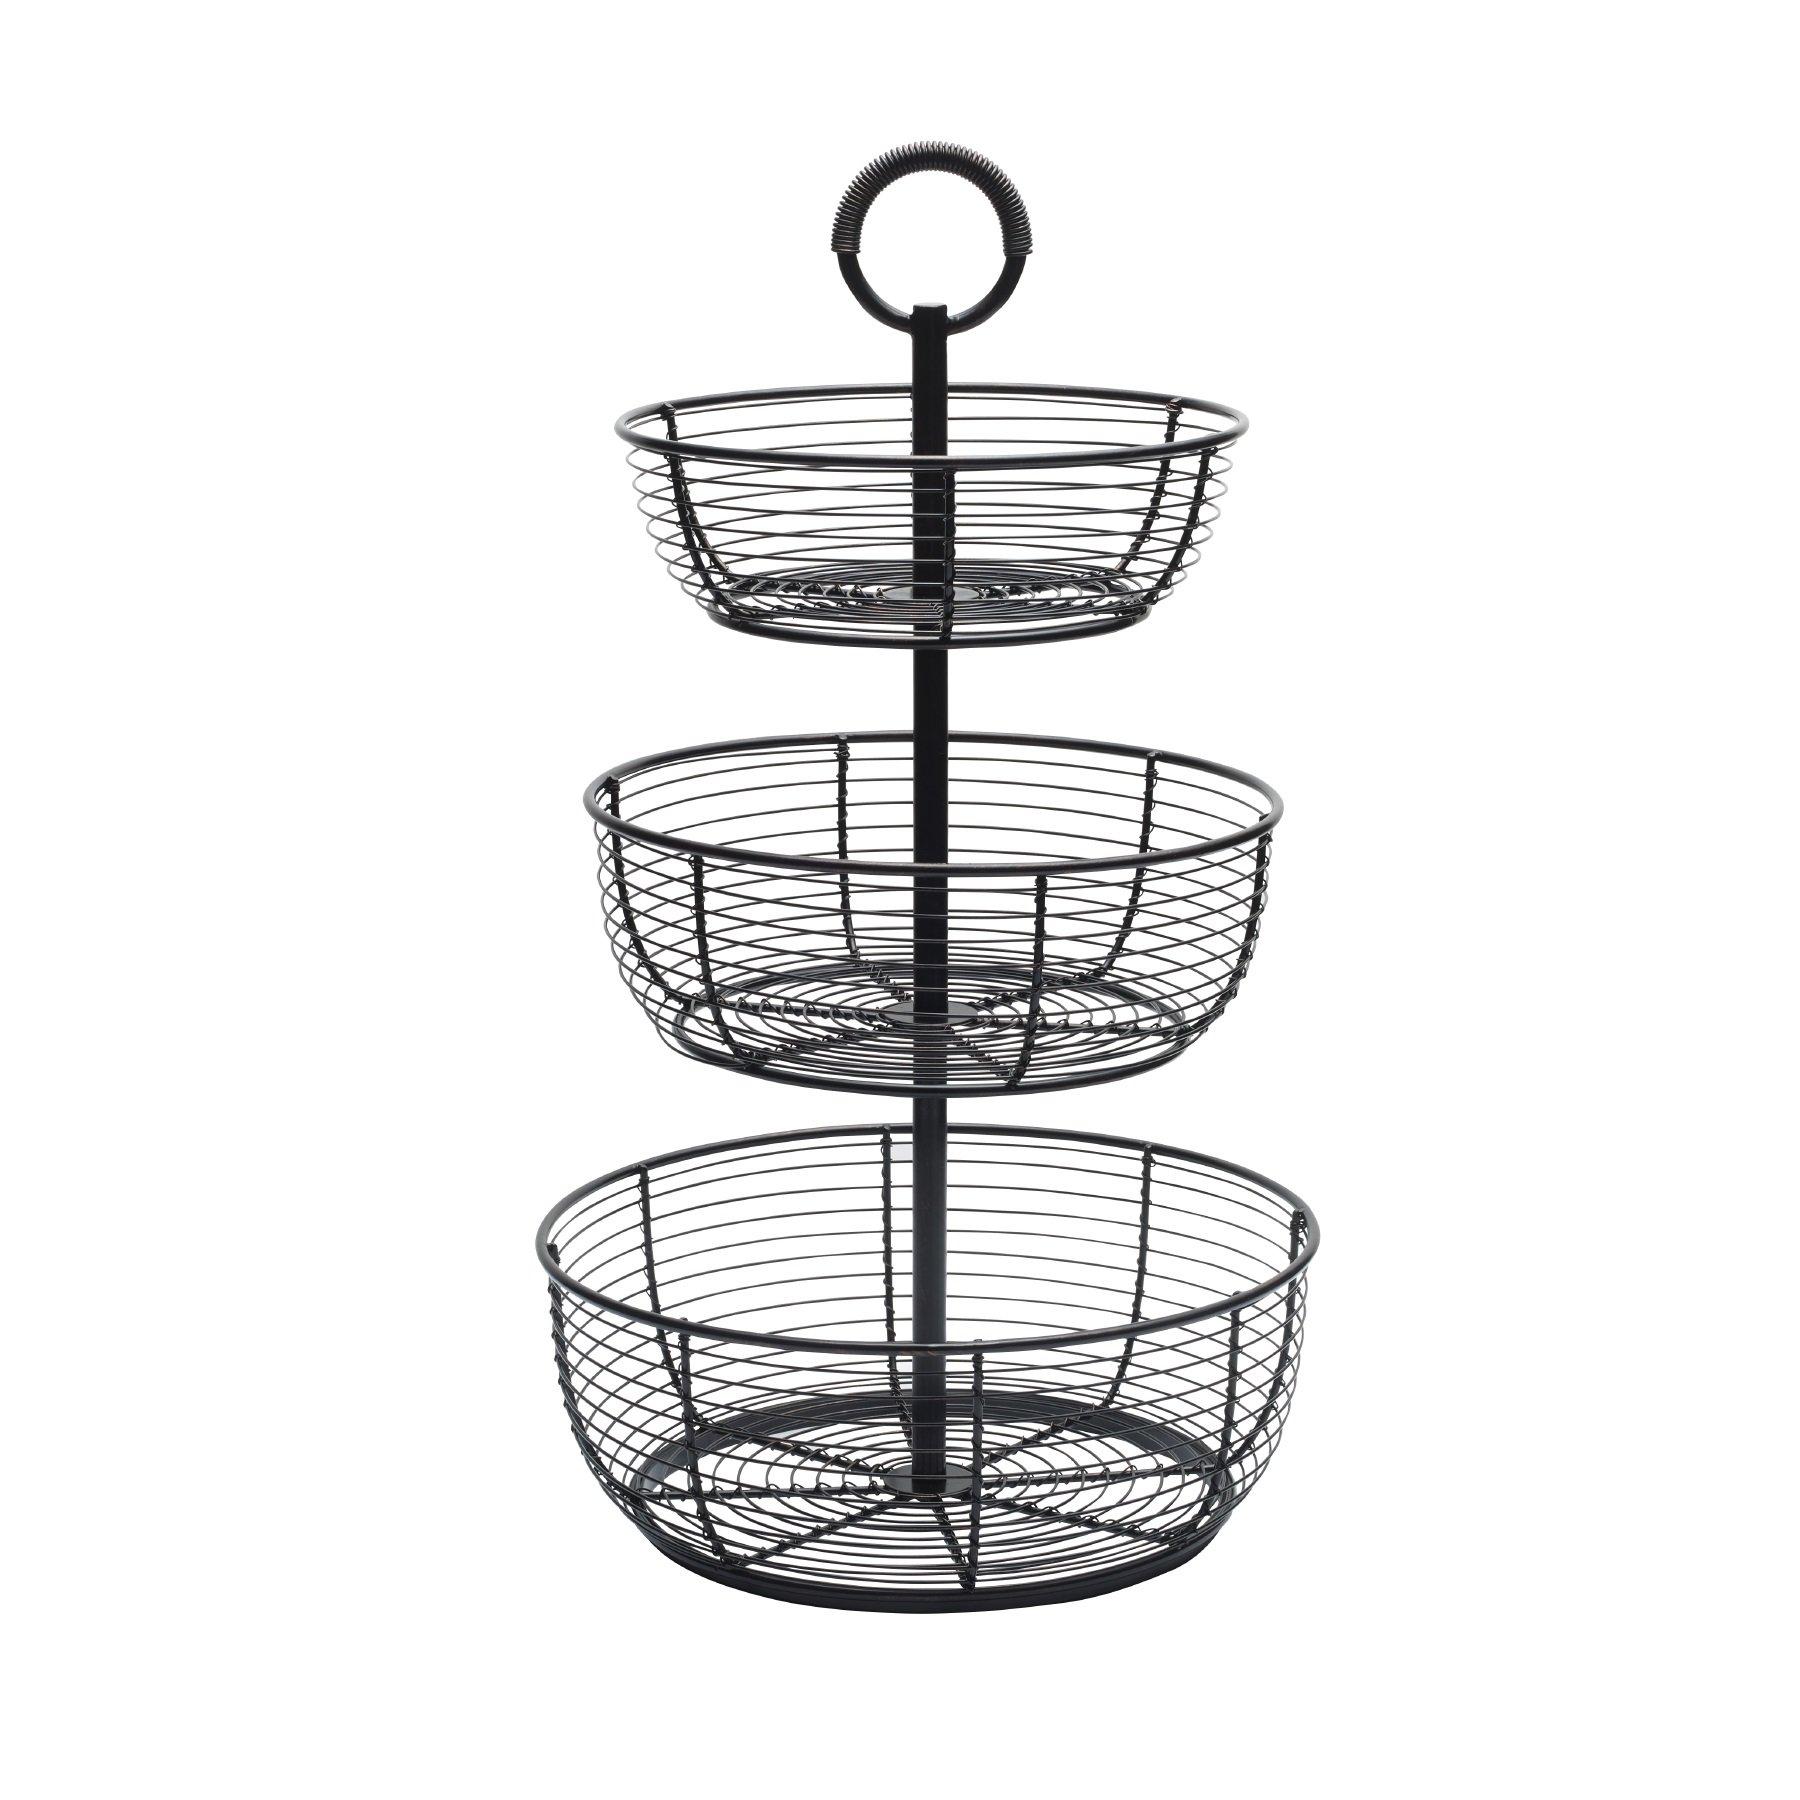 Gourmet Basics by Mikasa 5216454 3 Tier Round Wrap Basket 3 Metal Floor Standing Fruit/Home Storage, Antique Black